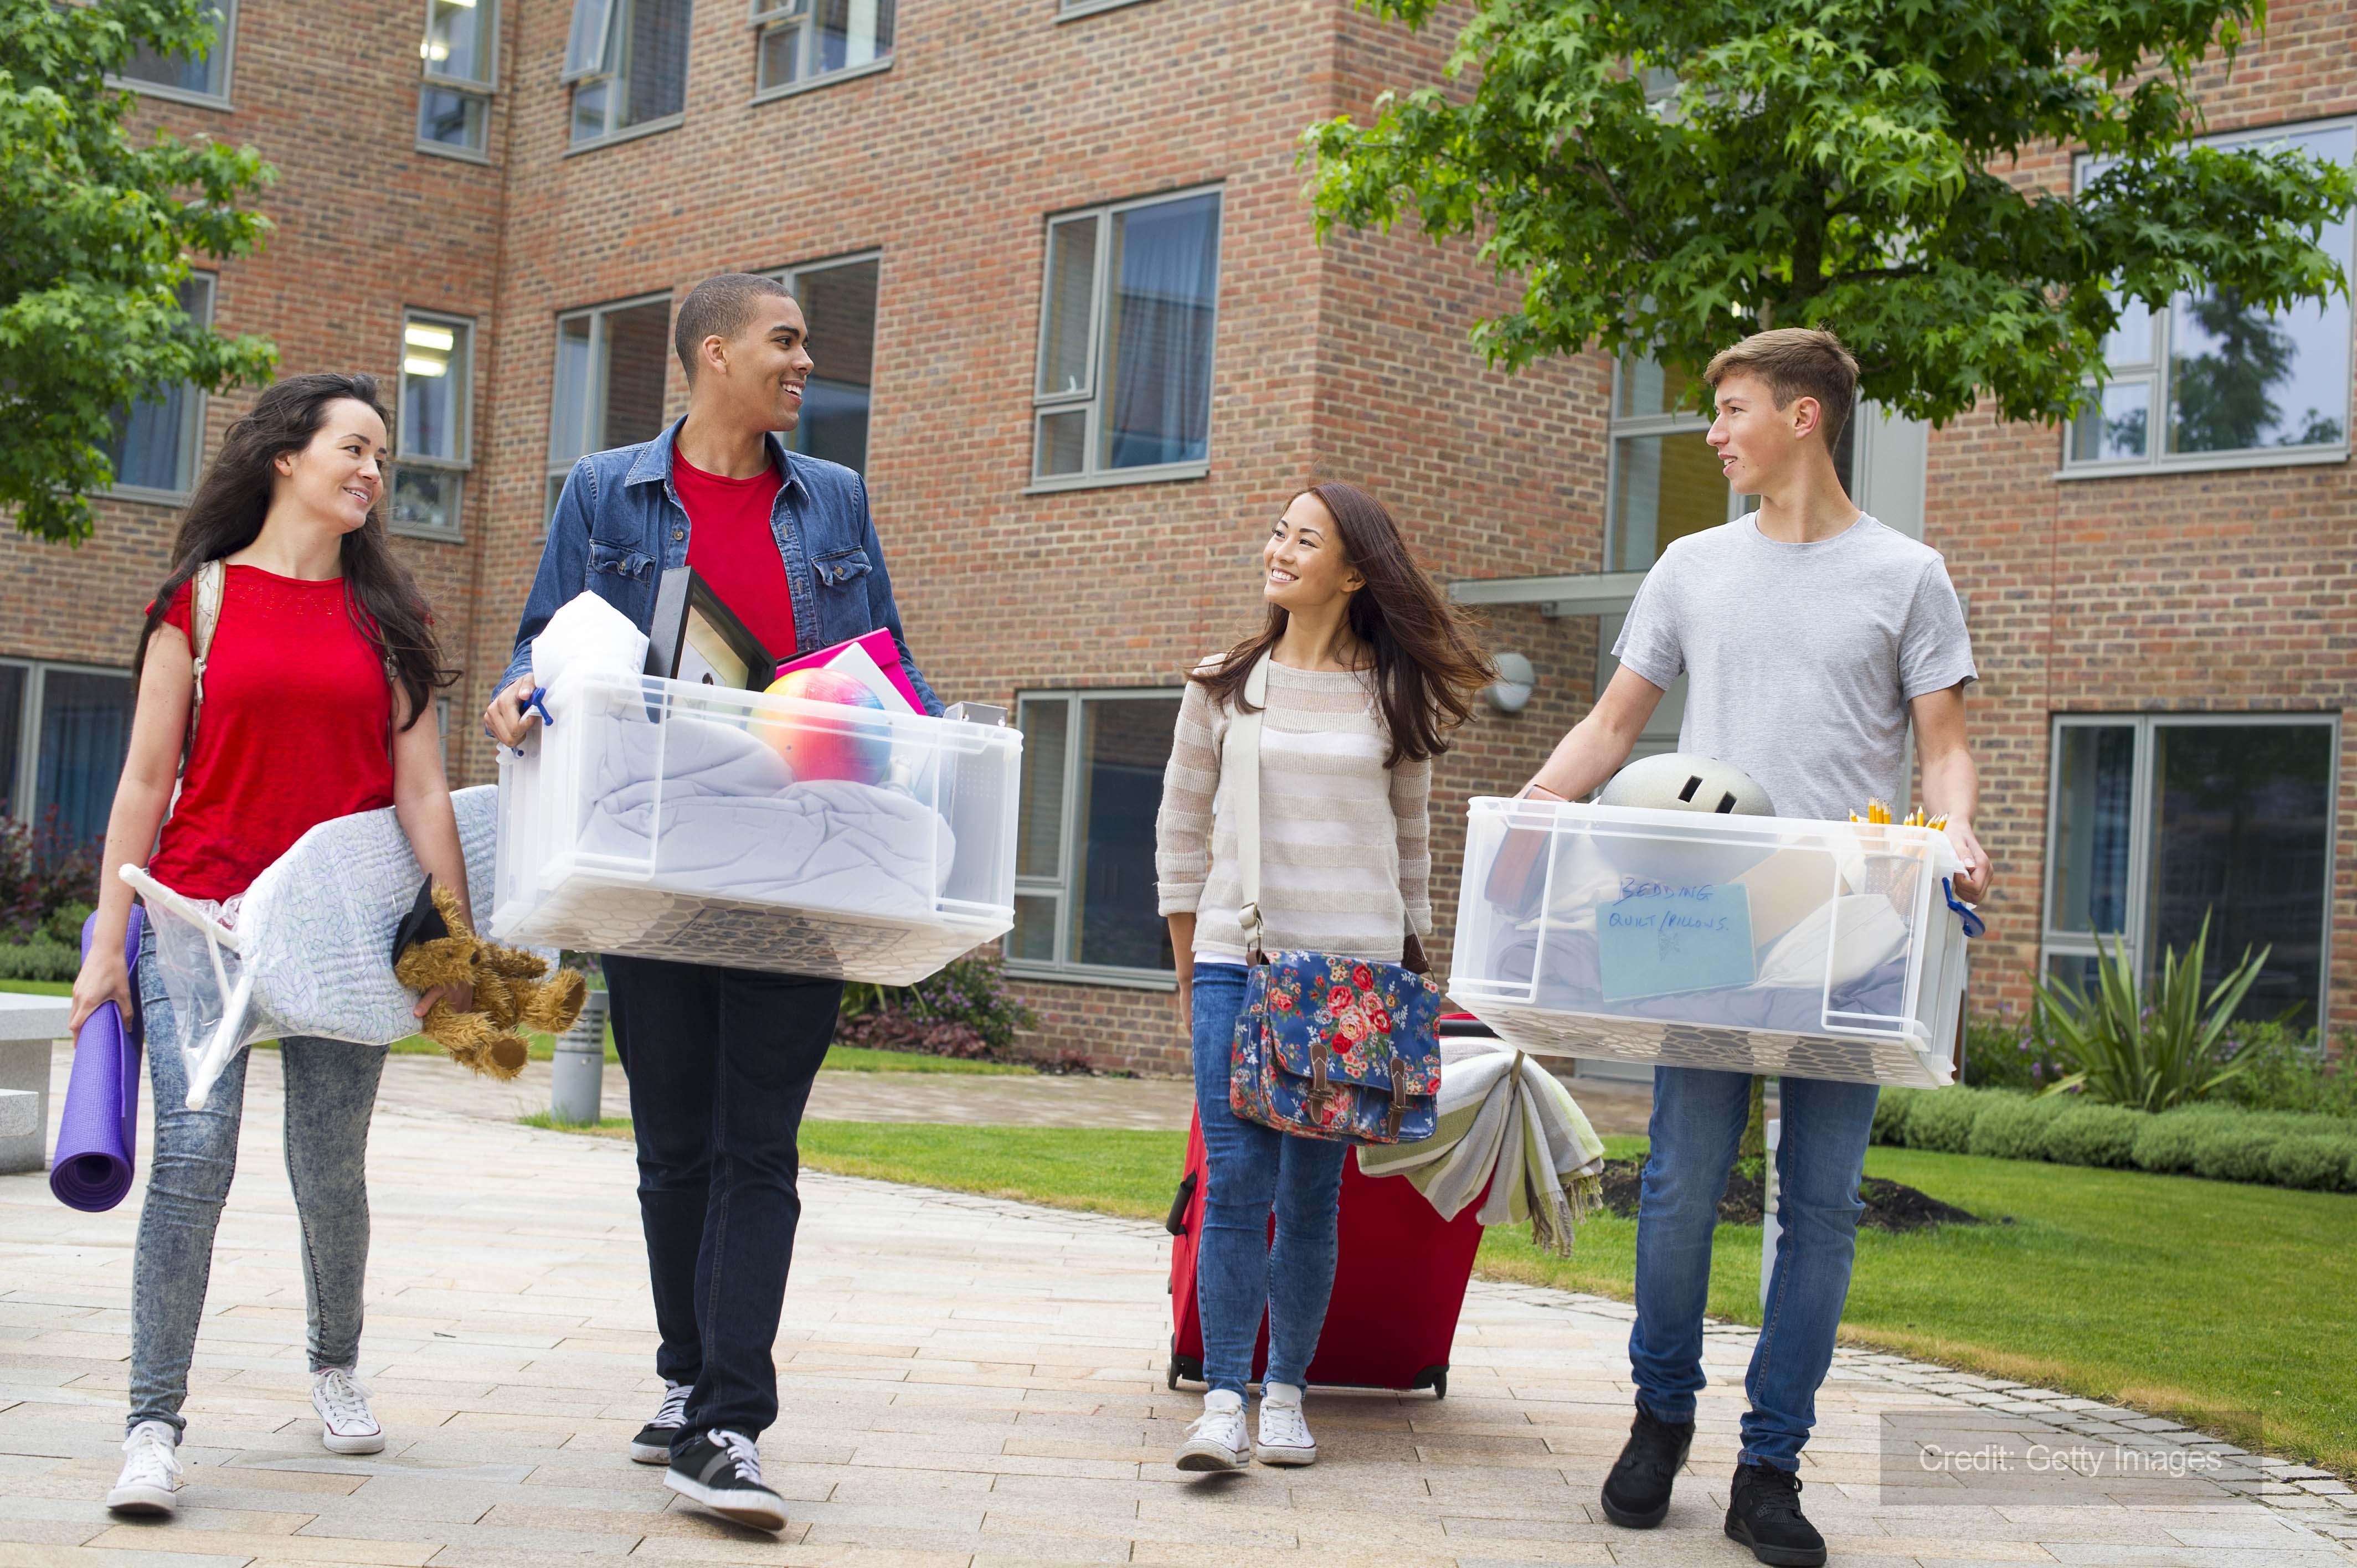 Andrews Boilers assist leading UK university